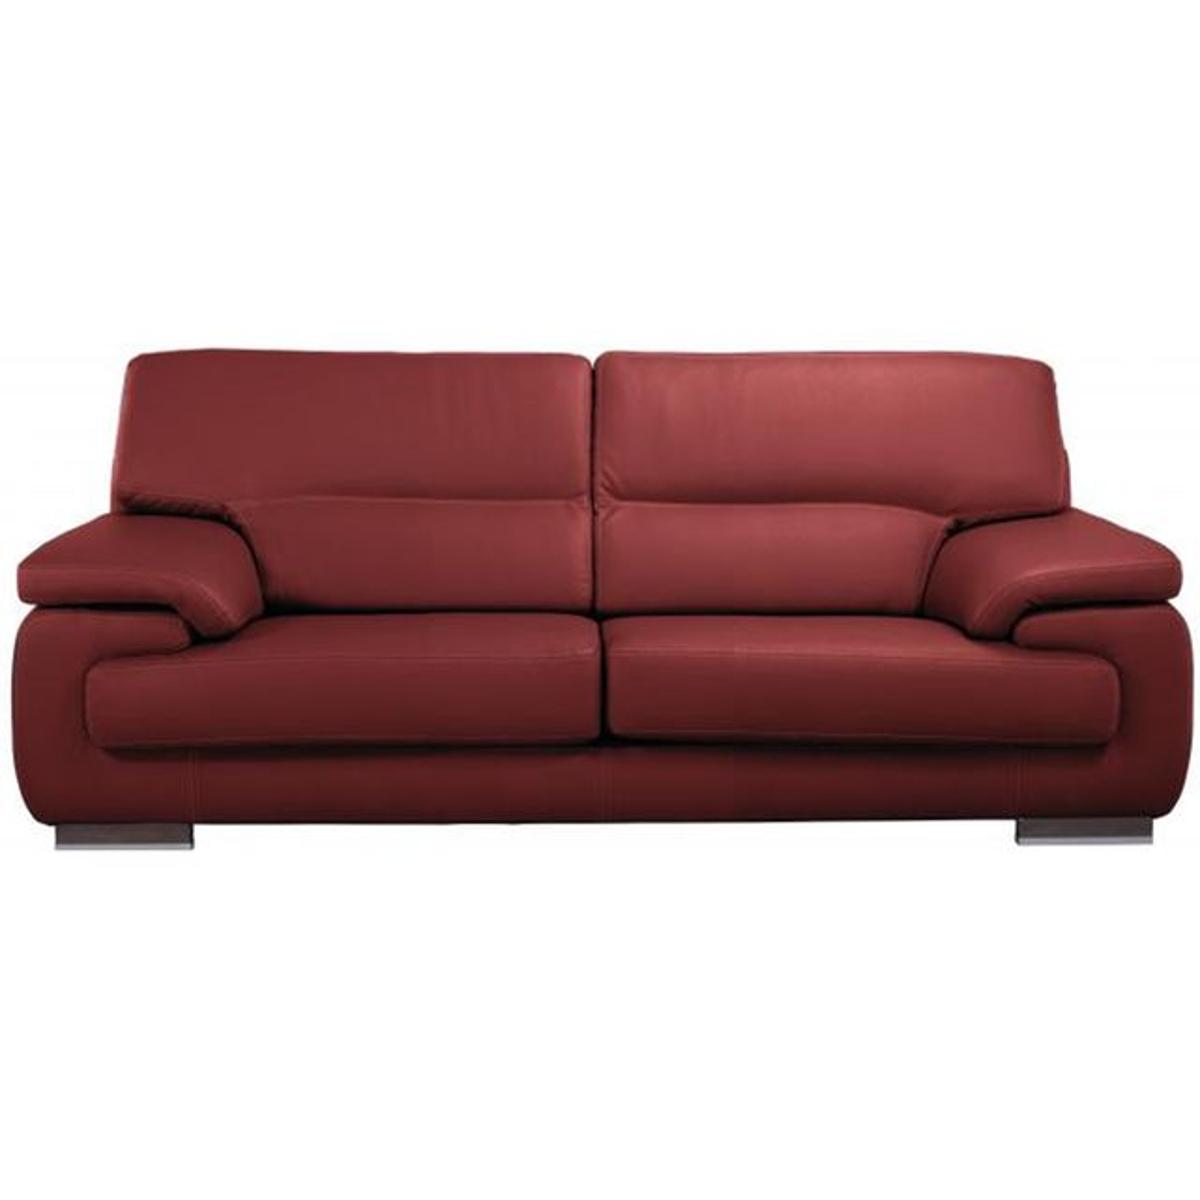 Canapé 2 places en cuir JOHN